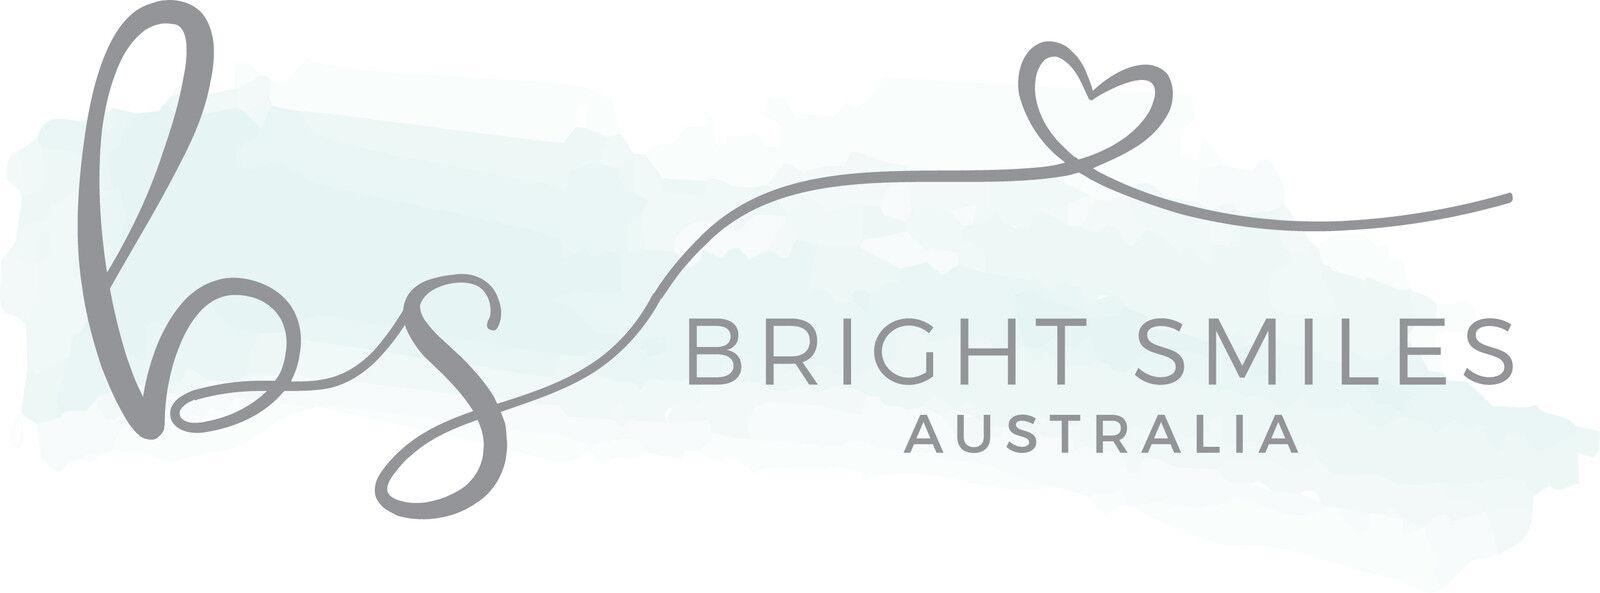 Bright Smiles Australia